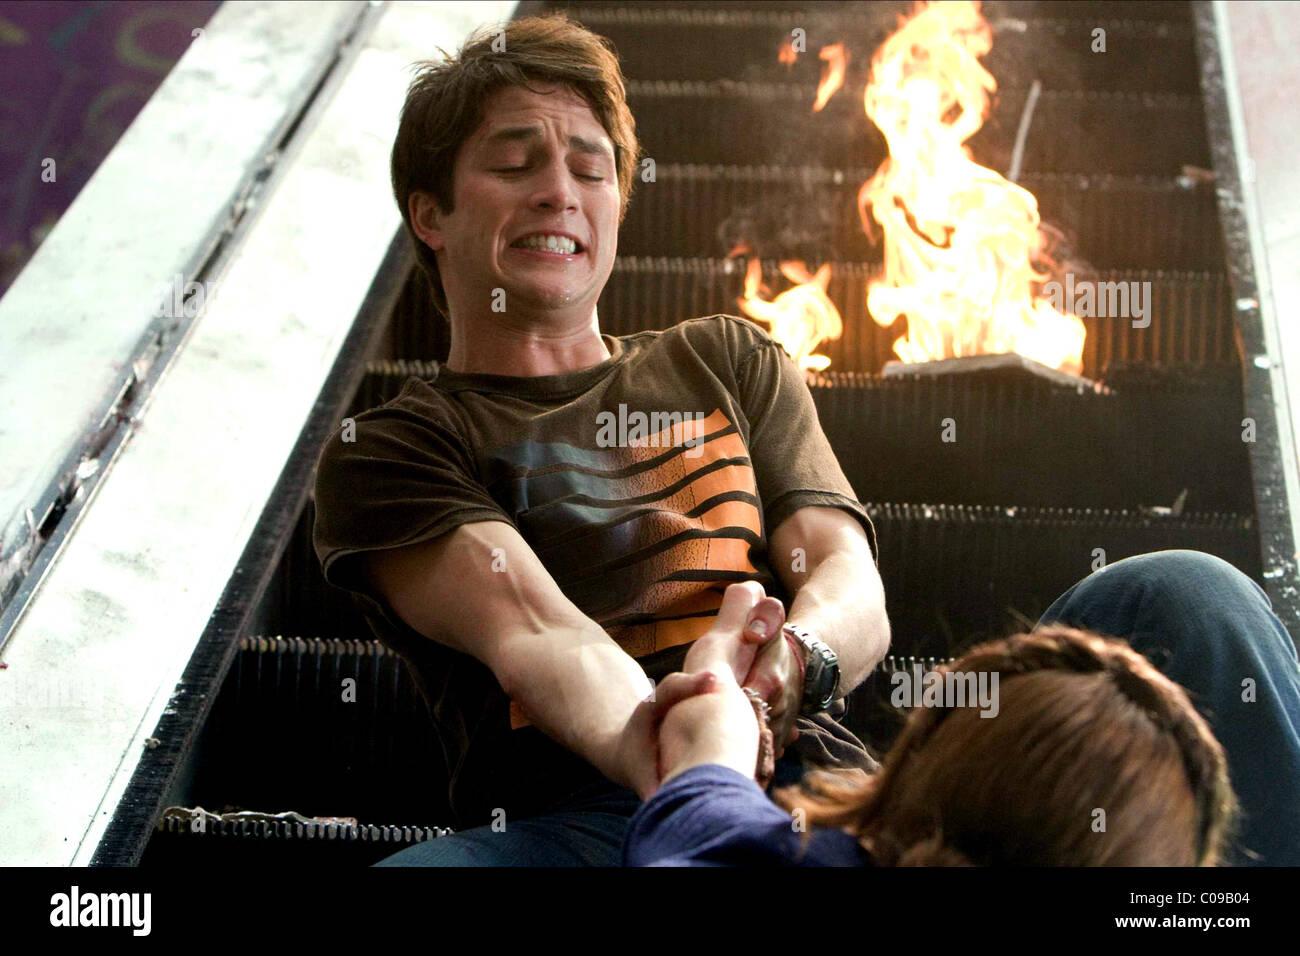 BOBBY CAMPO THE FINAL DESTINATION: DEATH TRIP 3D; FINAL DESTINATION 4 (2009) - Stock Image